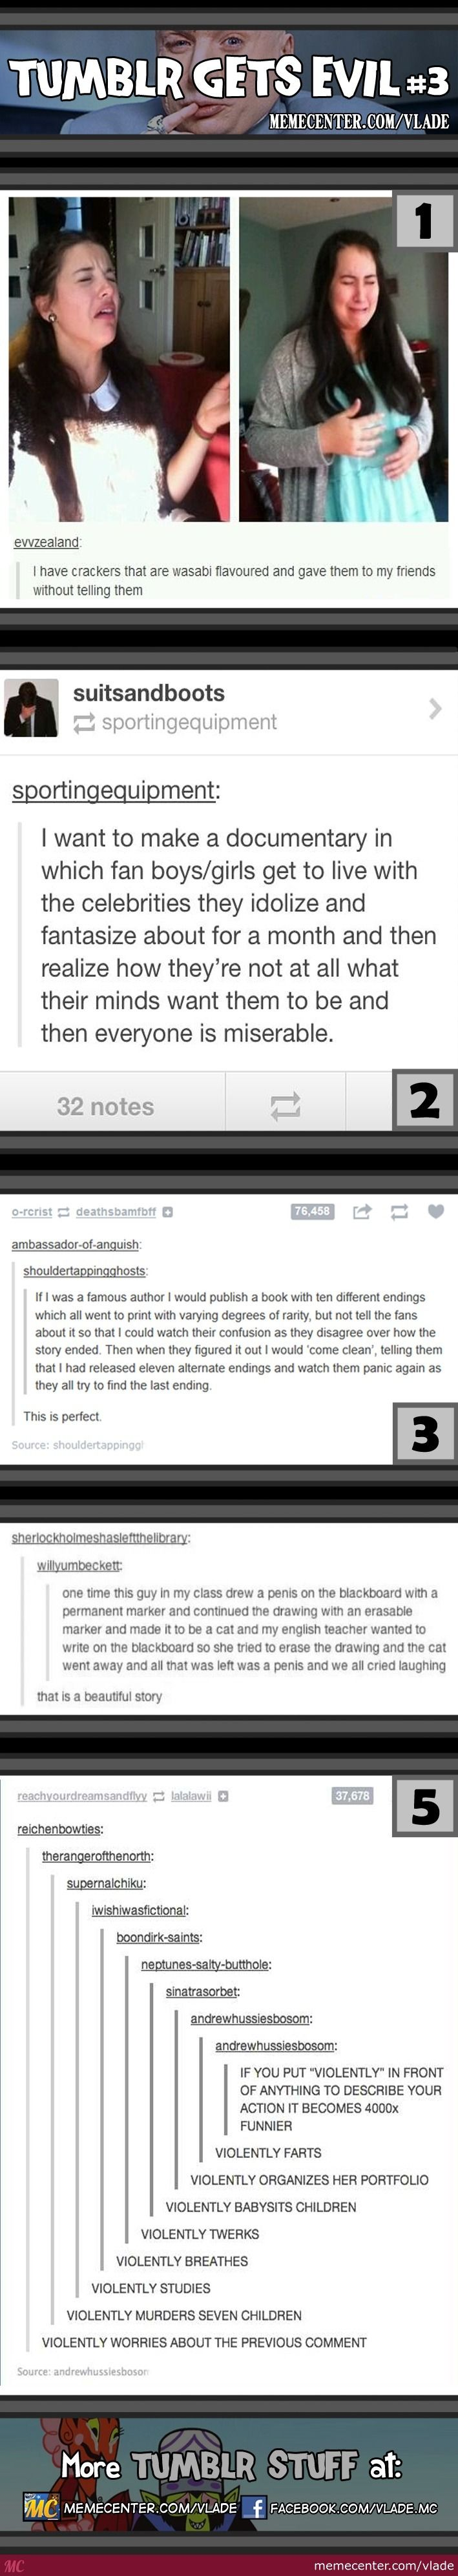 Tumblr Gets Evil #3